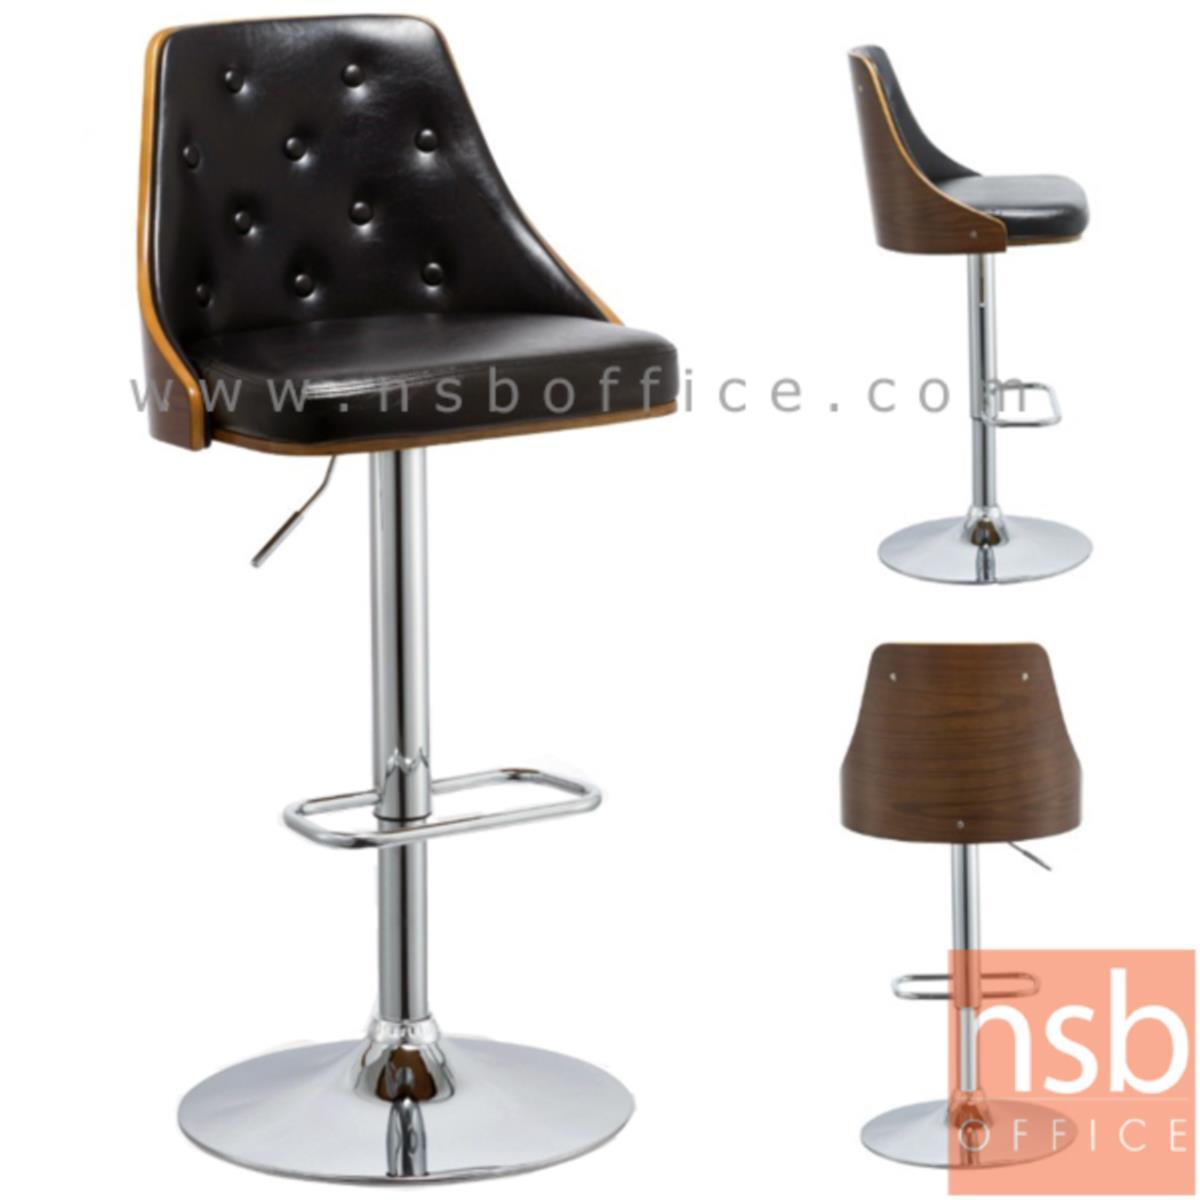 B18A040:เก้าอี้บาร์สูงหนัง PU BY-CAST รุ่น BHS-8871 ขนาด 49.5W cm. โช๊คแก๊ส ขาโครเมี่ยมฐานจานกลม